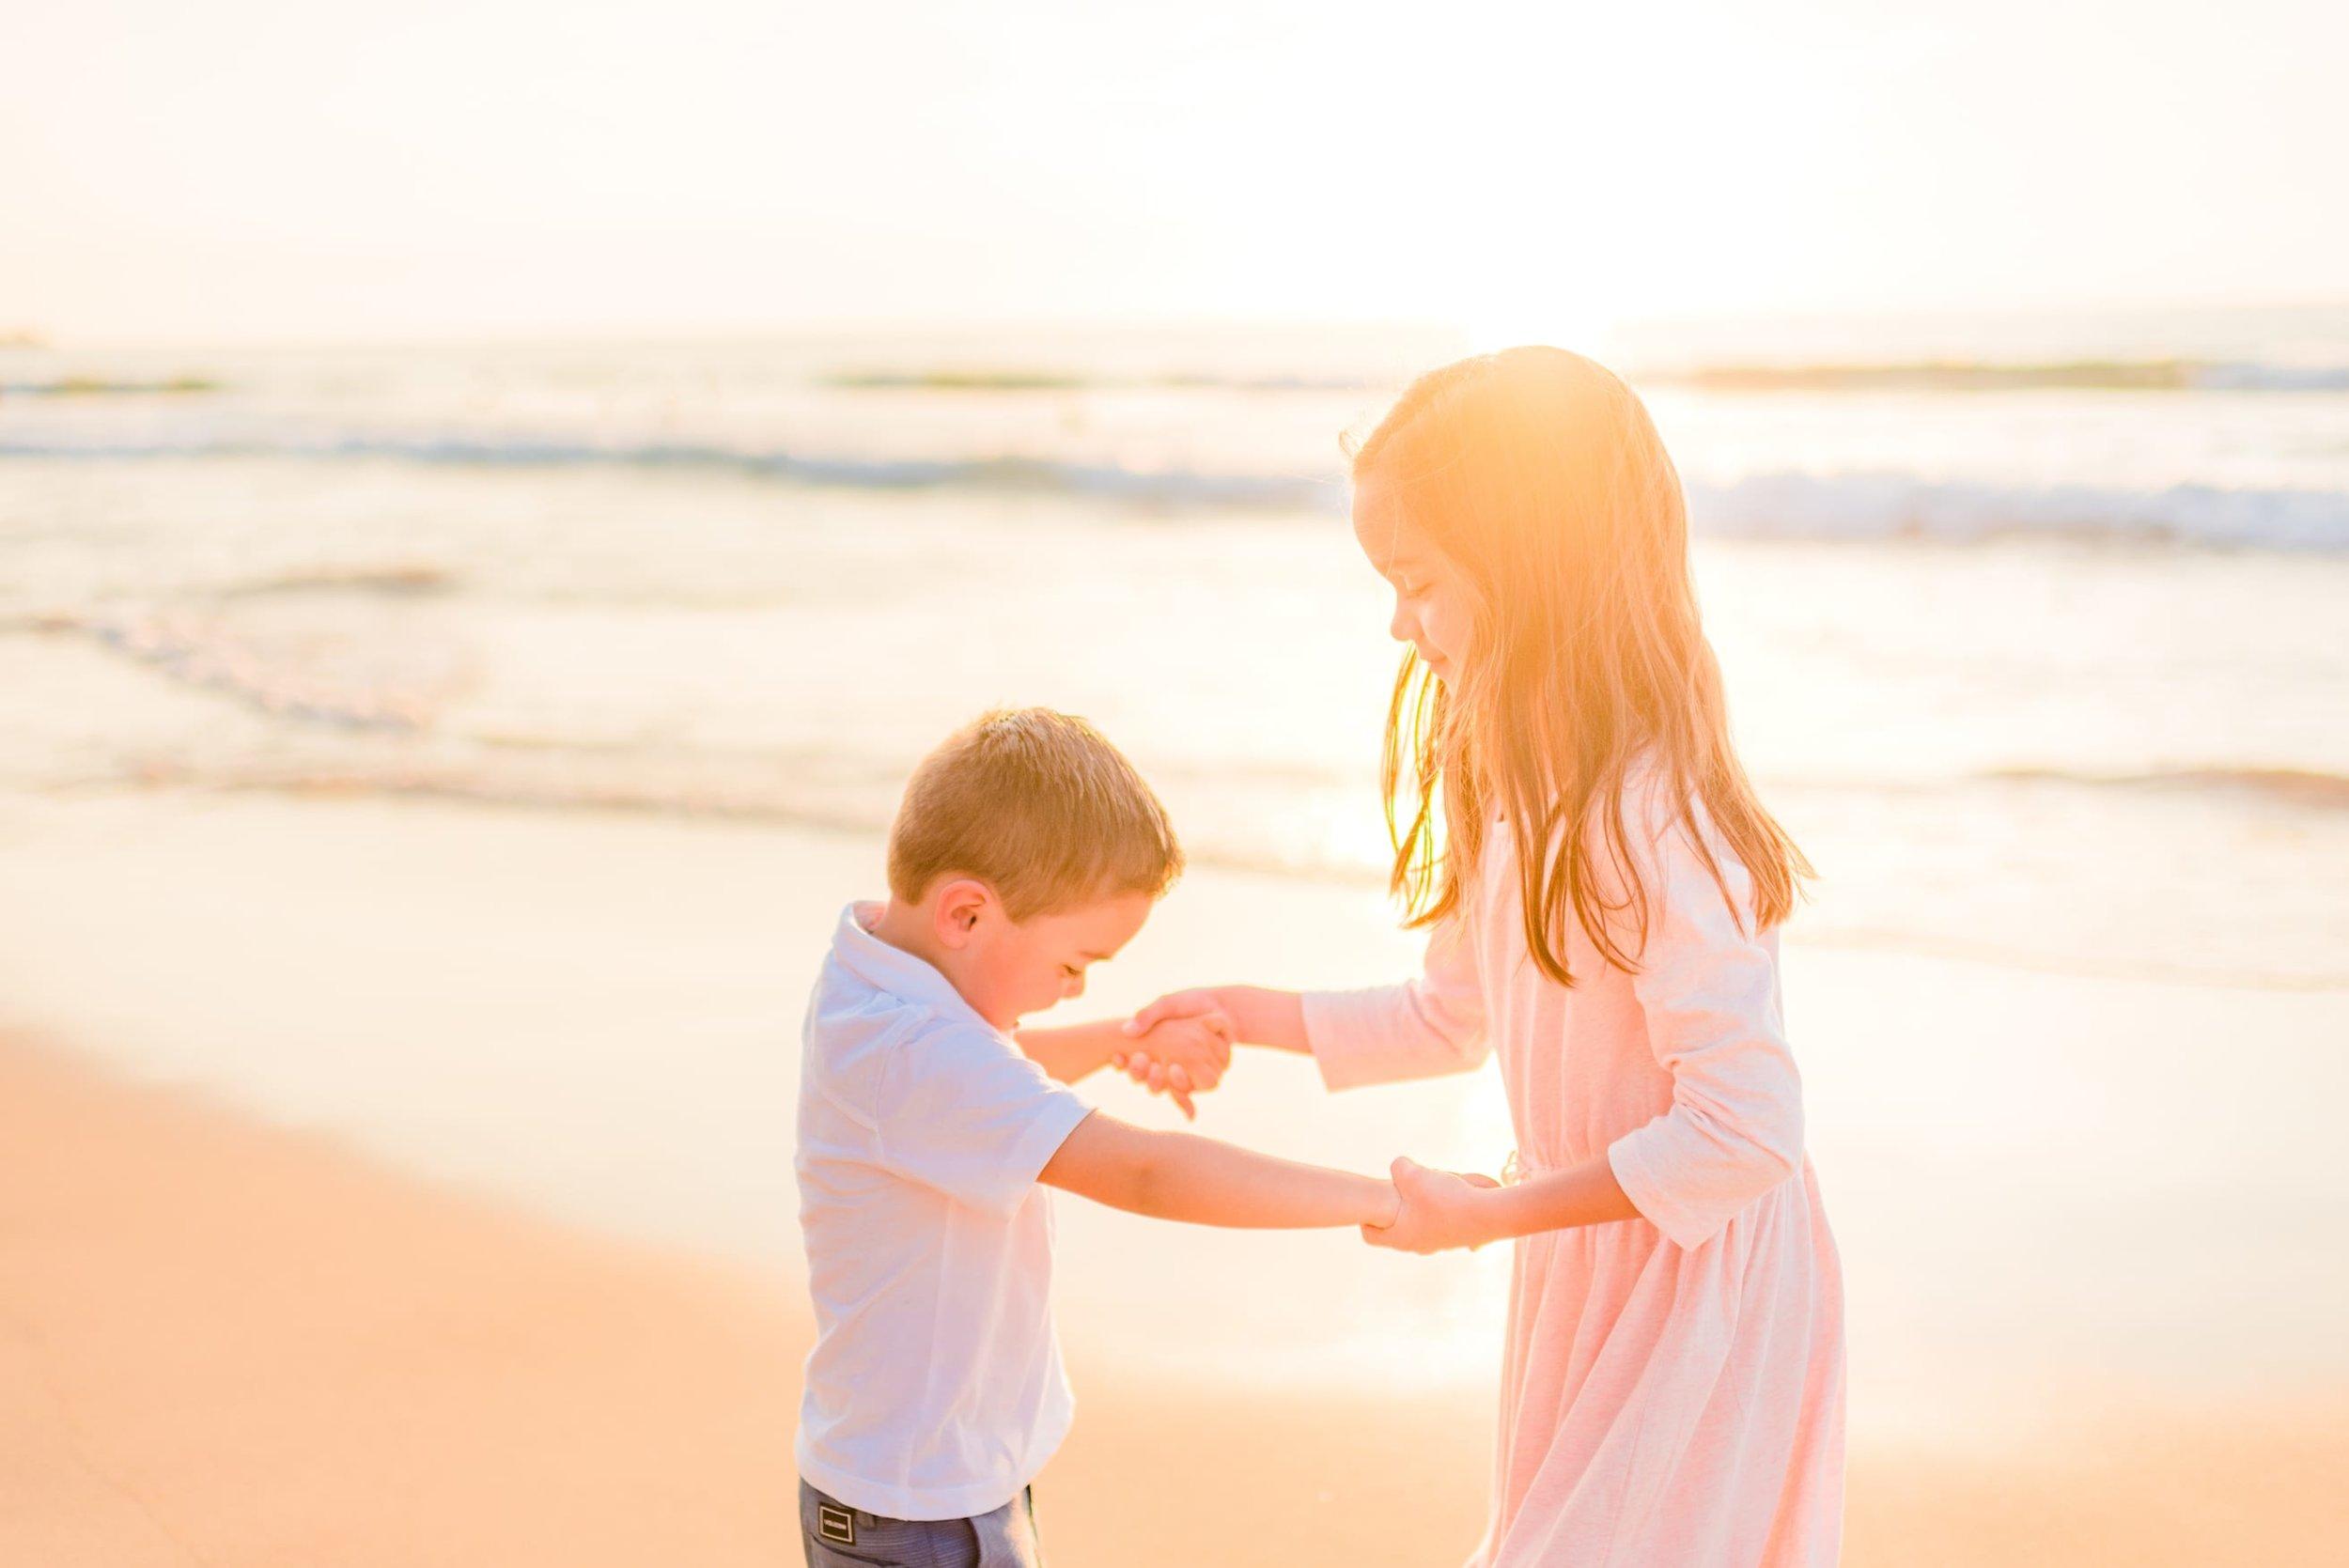 Waikoloa-Hawaii-Family-Photographer-Beach-02.jpg